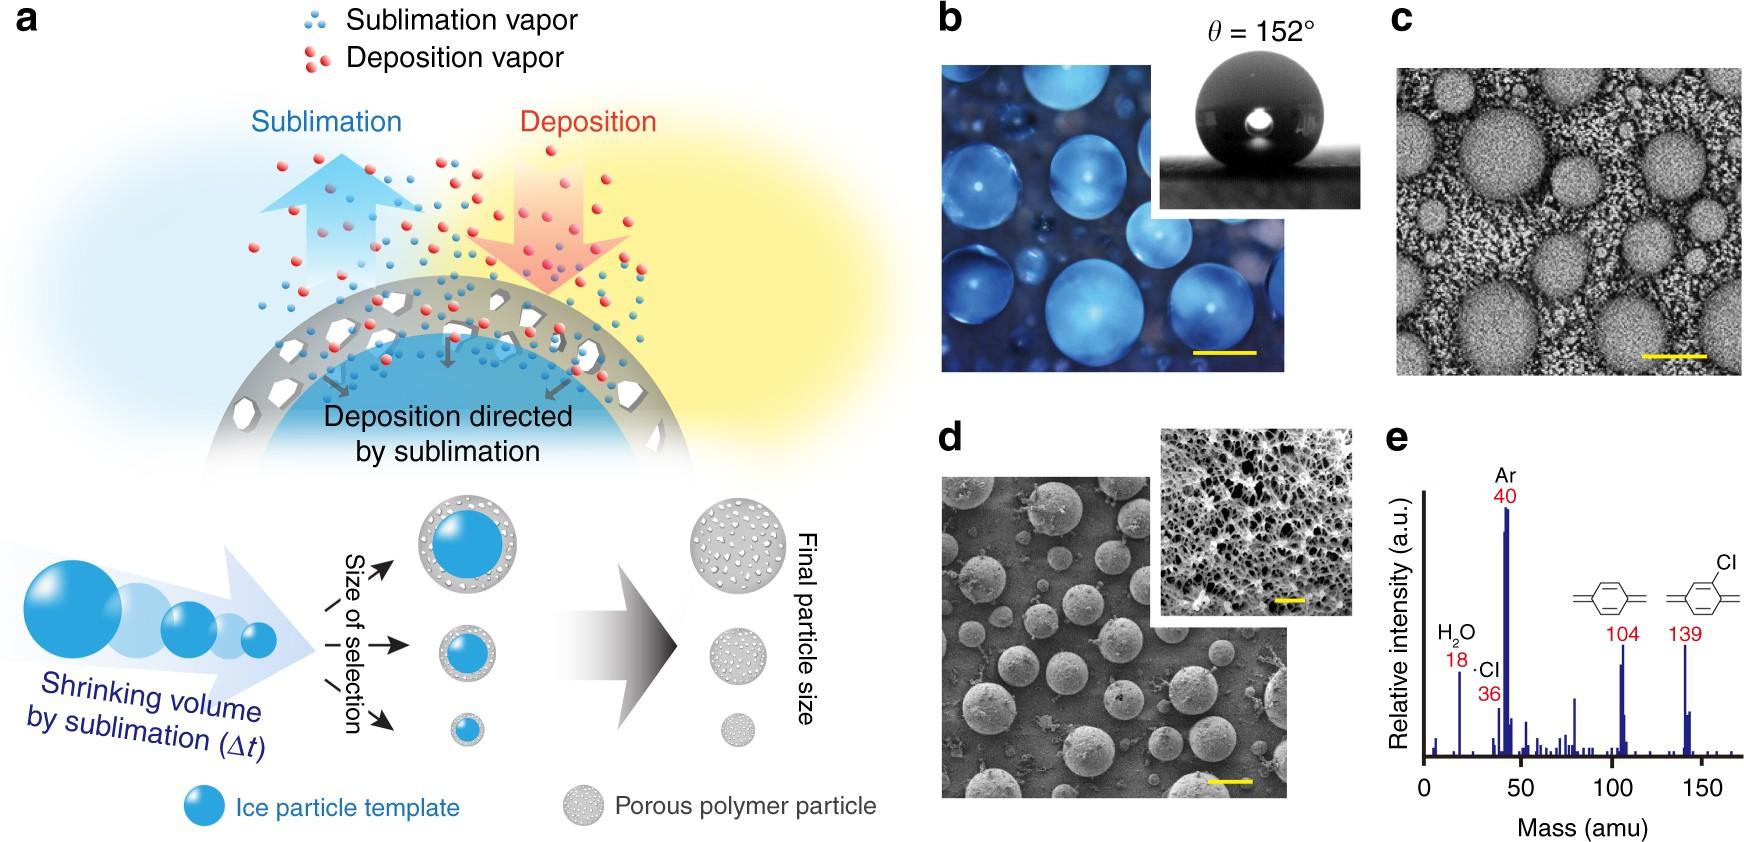 vapor sublimation and deposition to build porous particles and composites nature communications